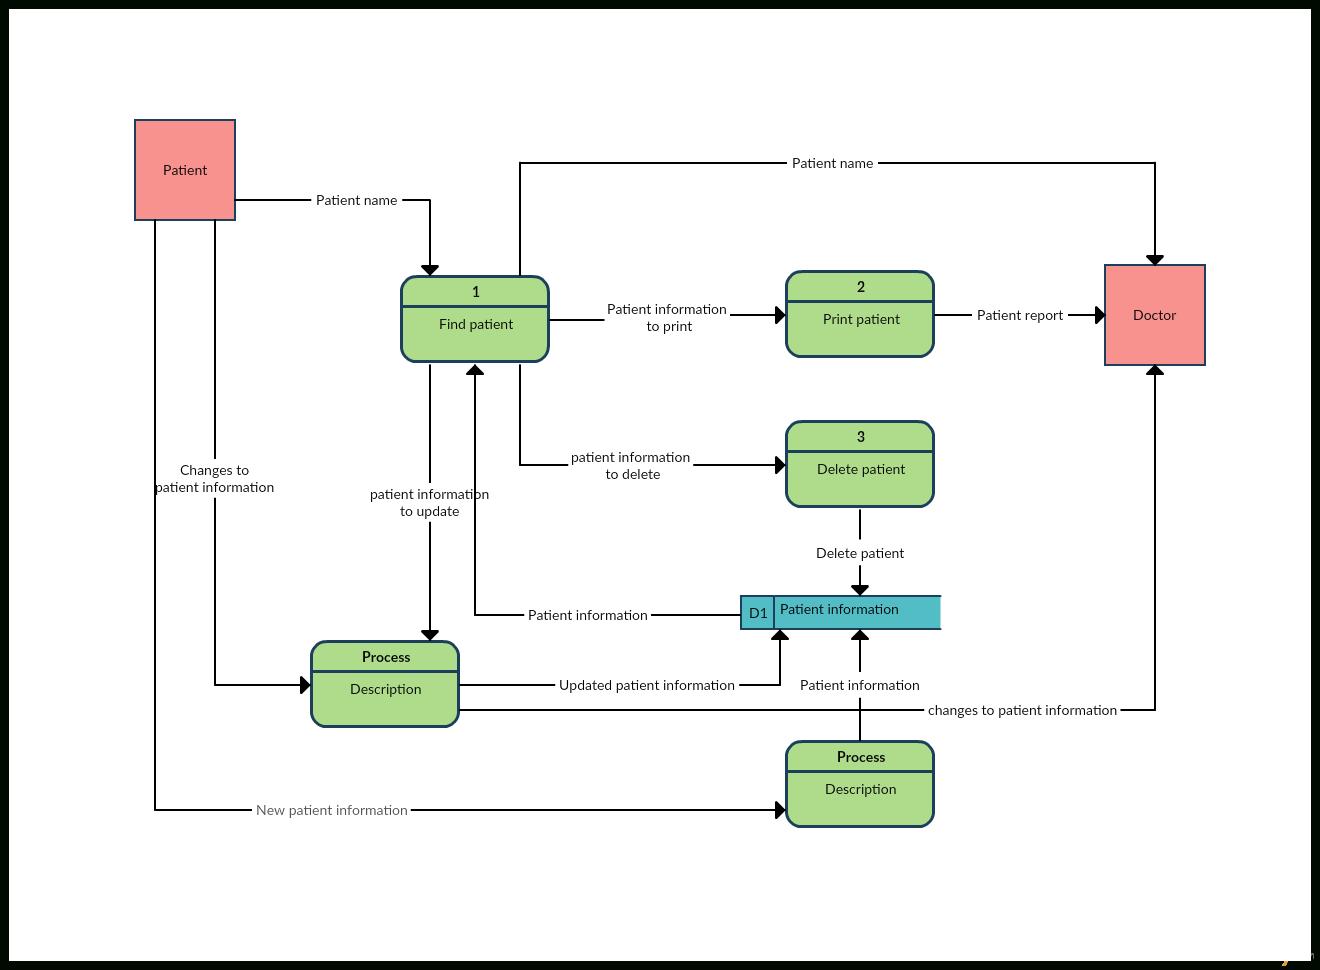 Data Flow Diagram Templates To Map Data Flows - Creately Blog with Er Diagram Vs Dfd